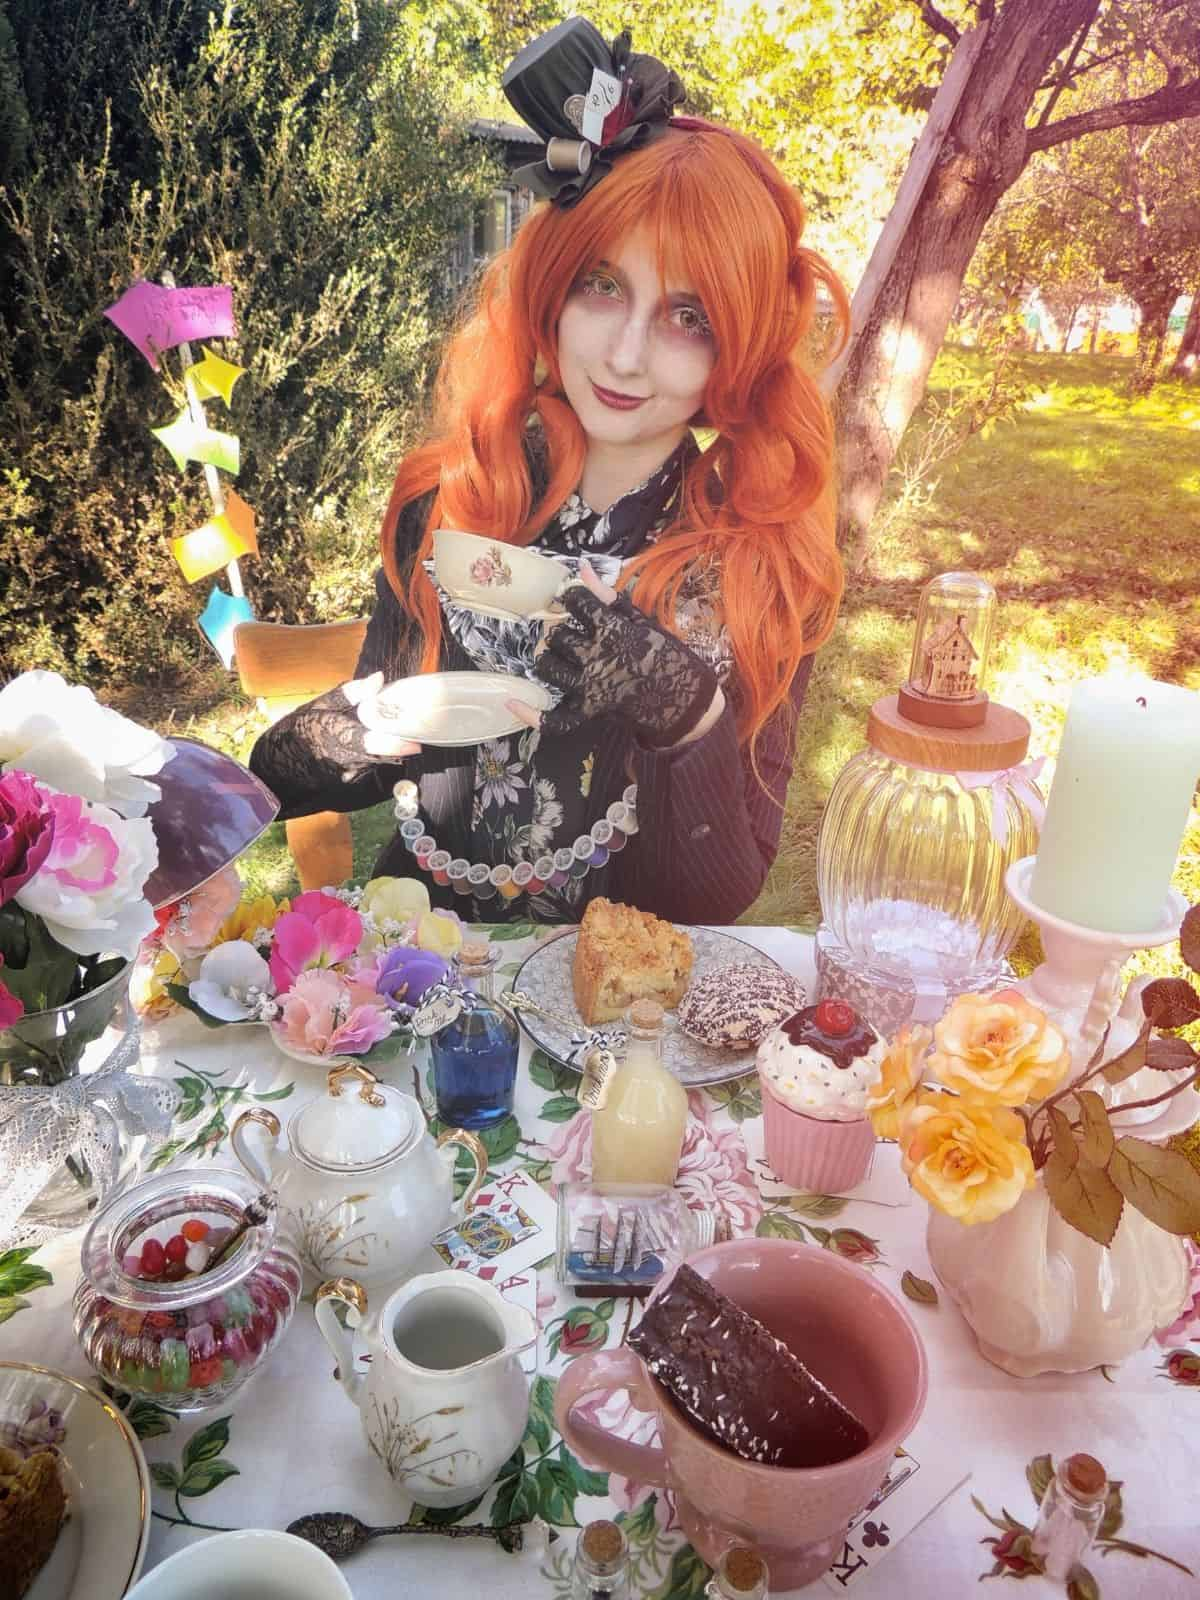 alice in wonderland with tea